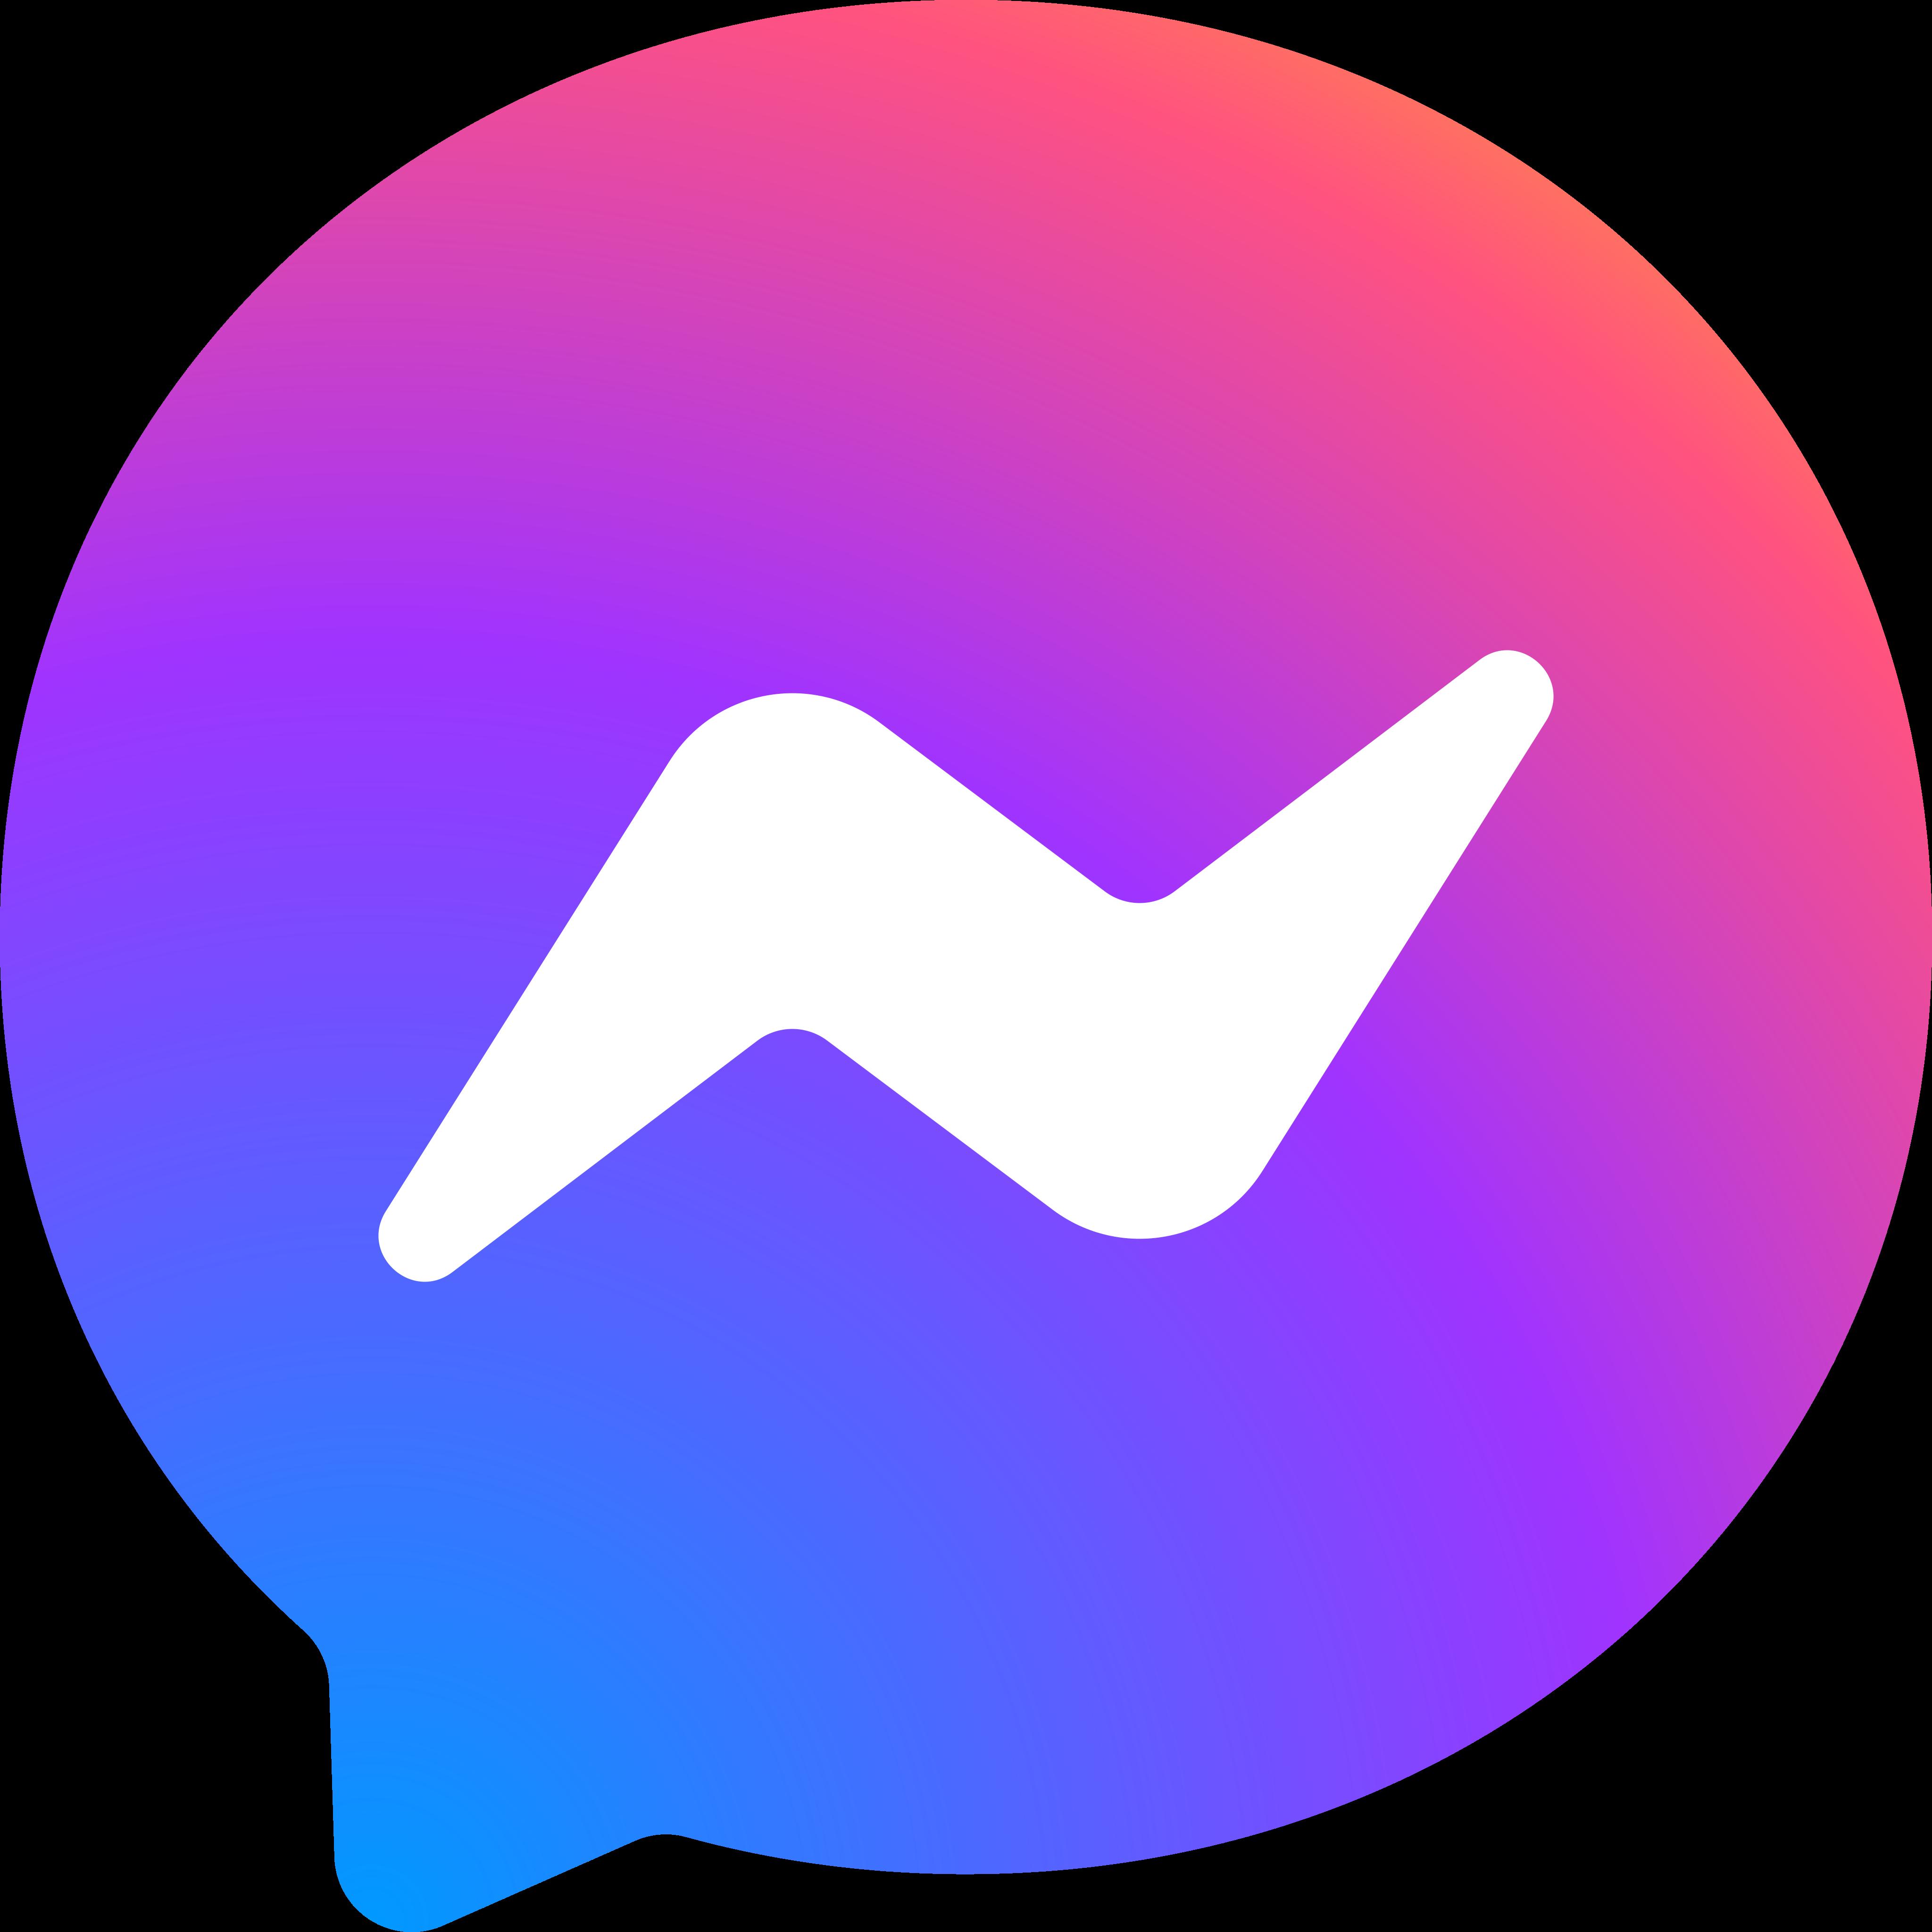 facebook messenger logo 8 - Facebook Messenger Logo